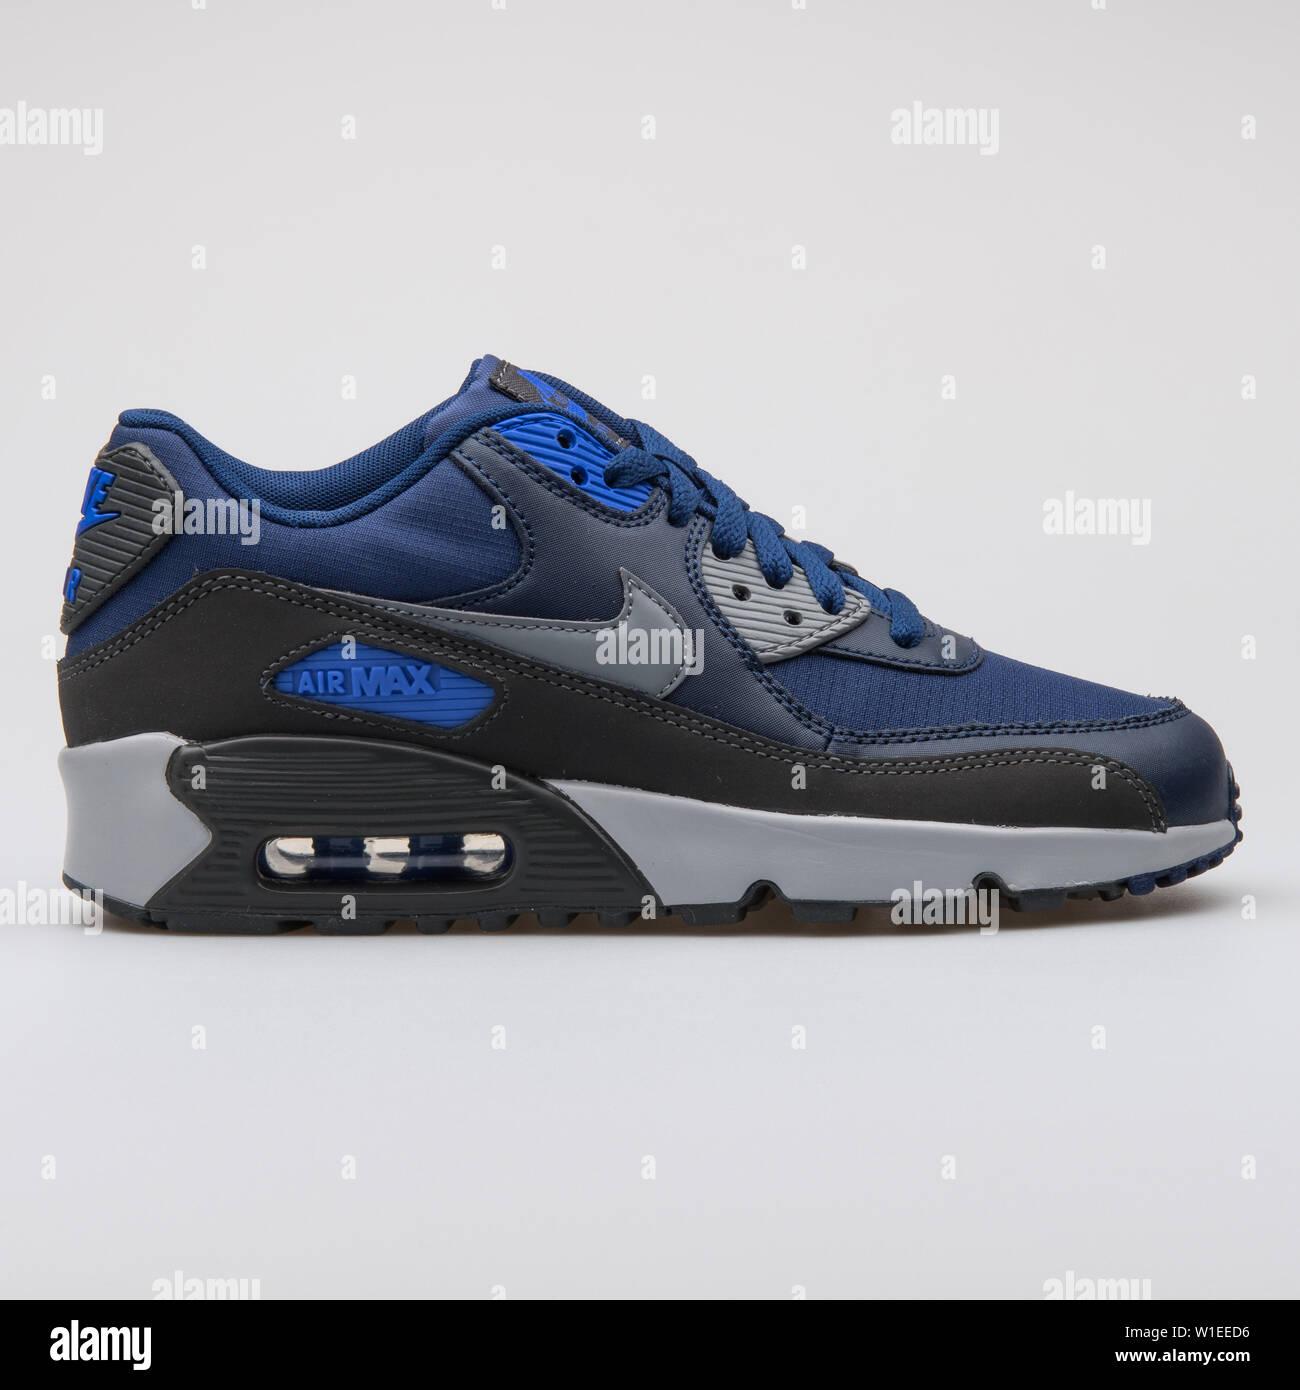 Nike Kids Air Max 90 Mesh GS, BLACKWHITE VIVID PINK, Youth